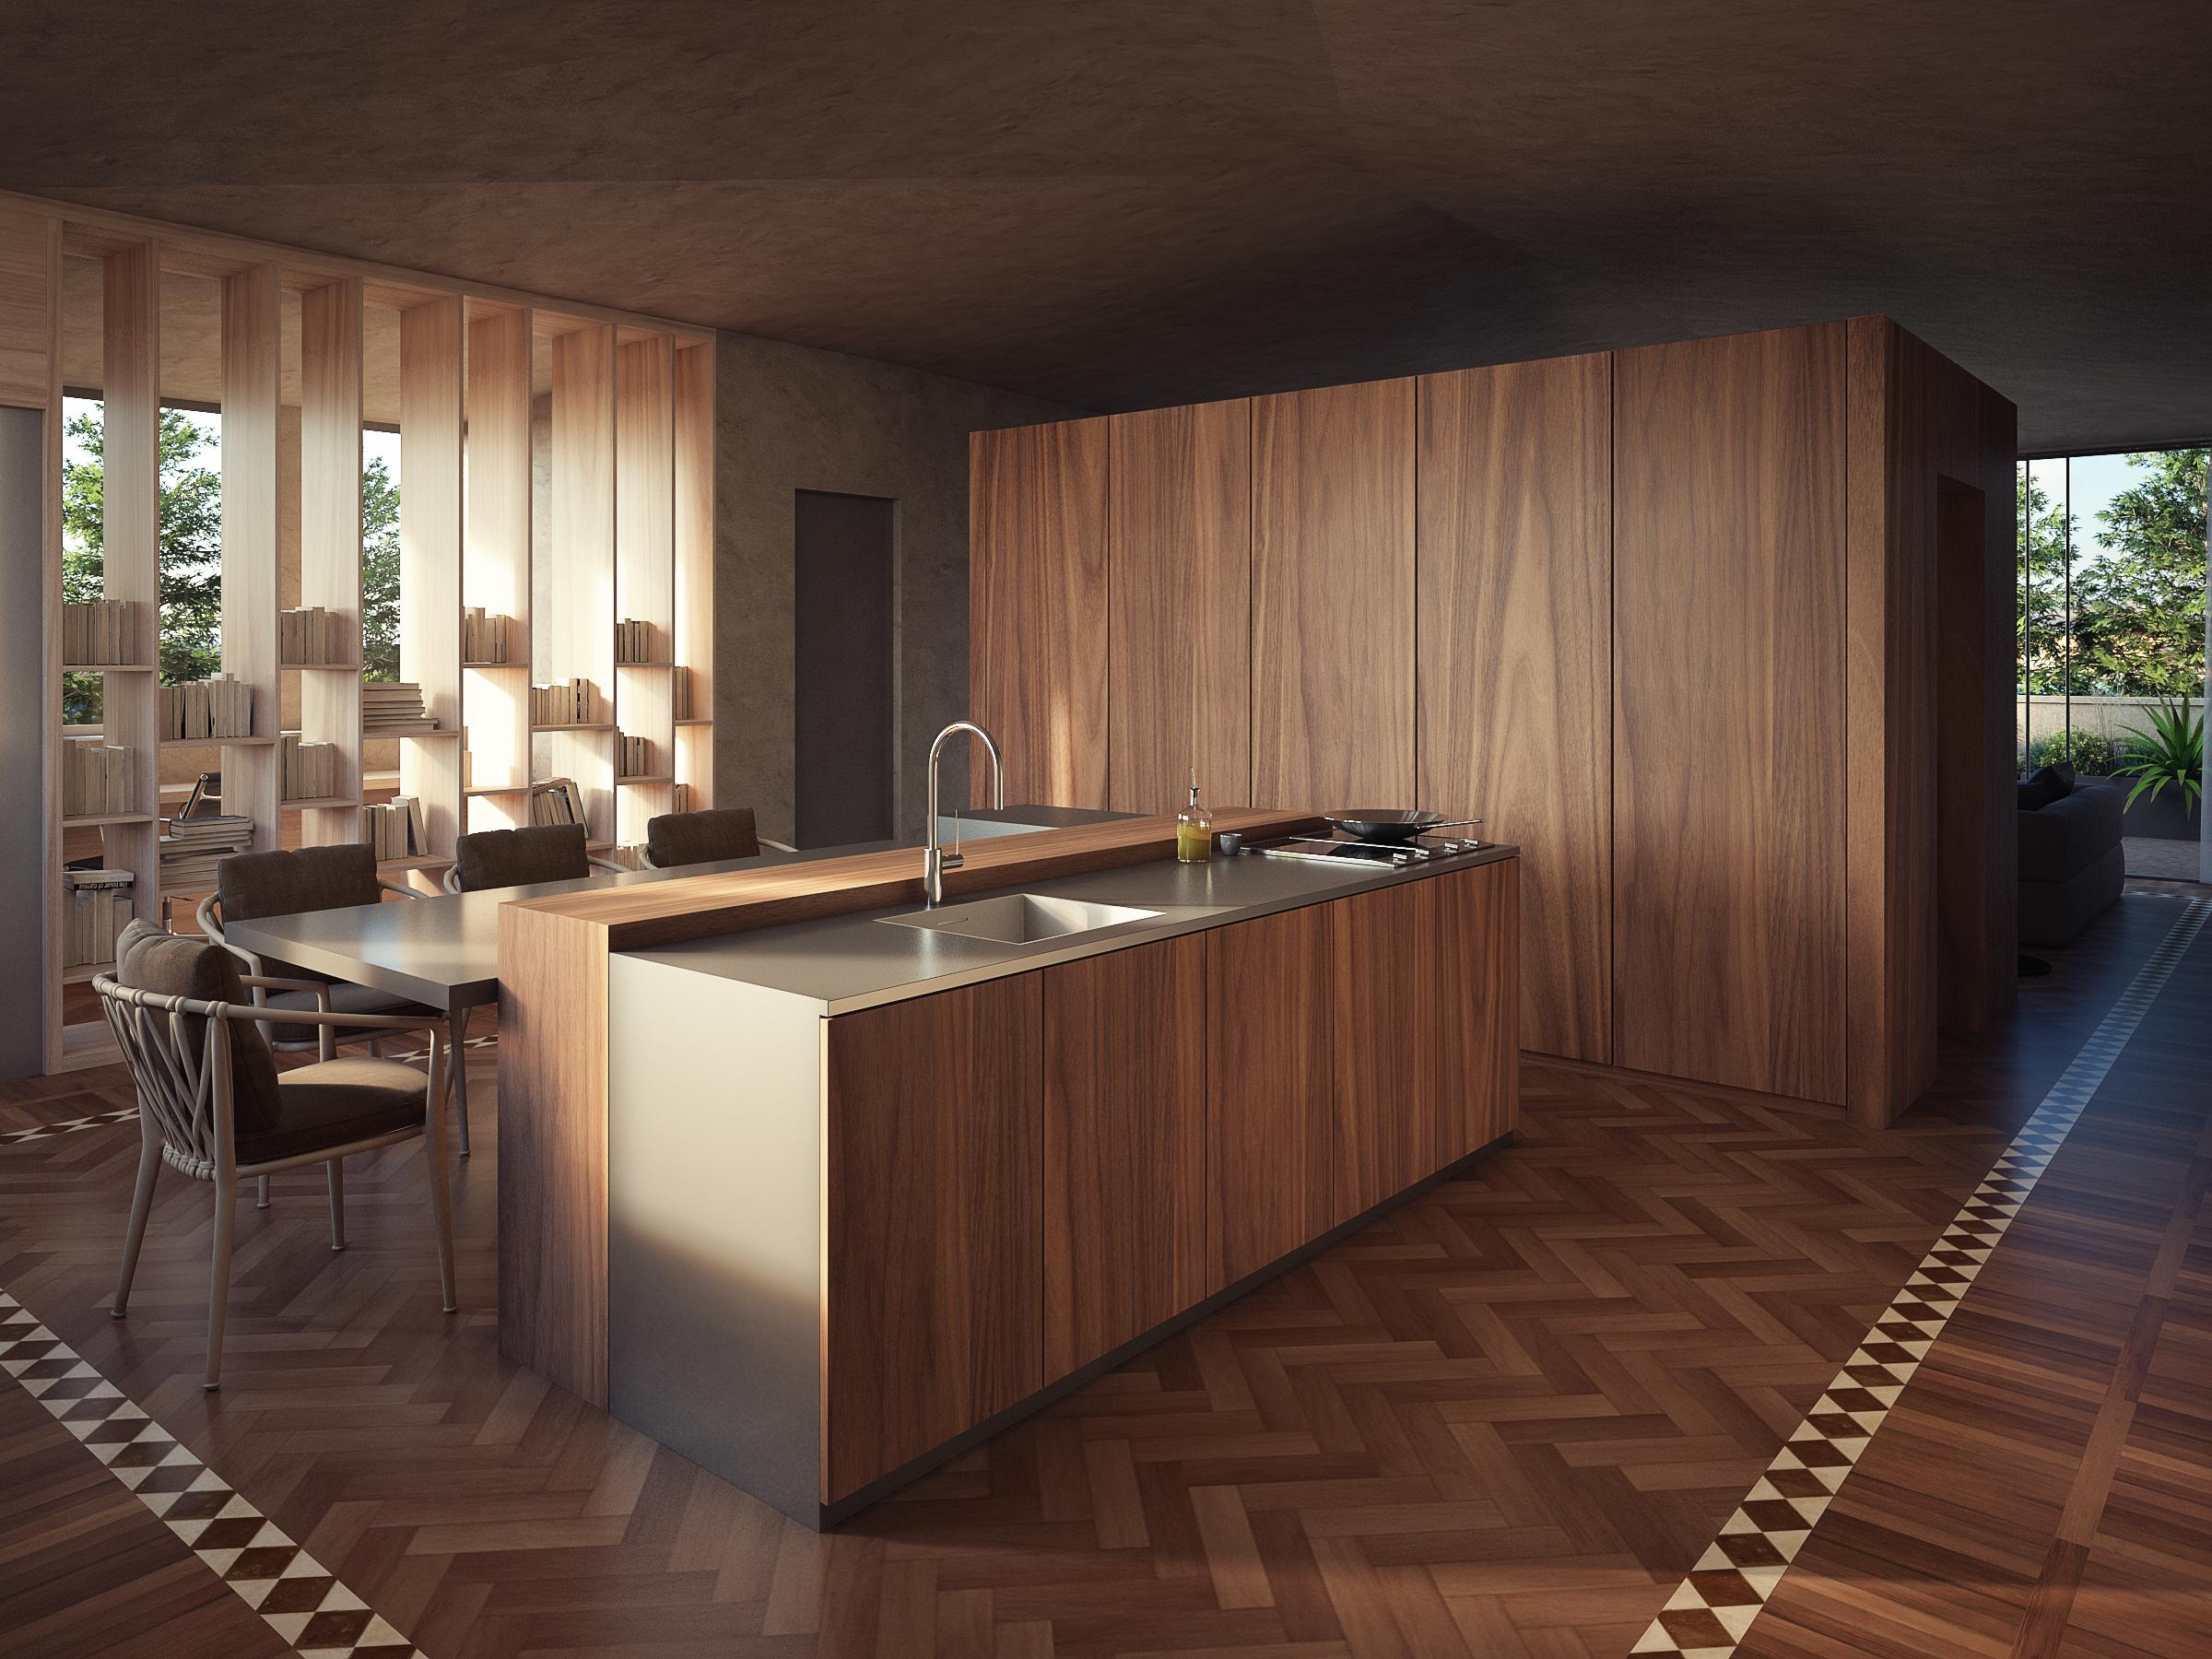 R7 - cucina - unità 6 piano 2 sottot